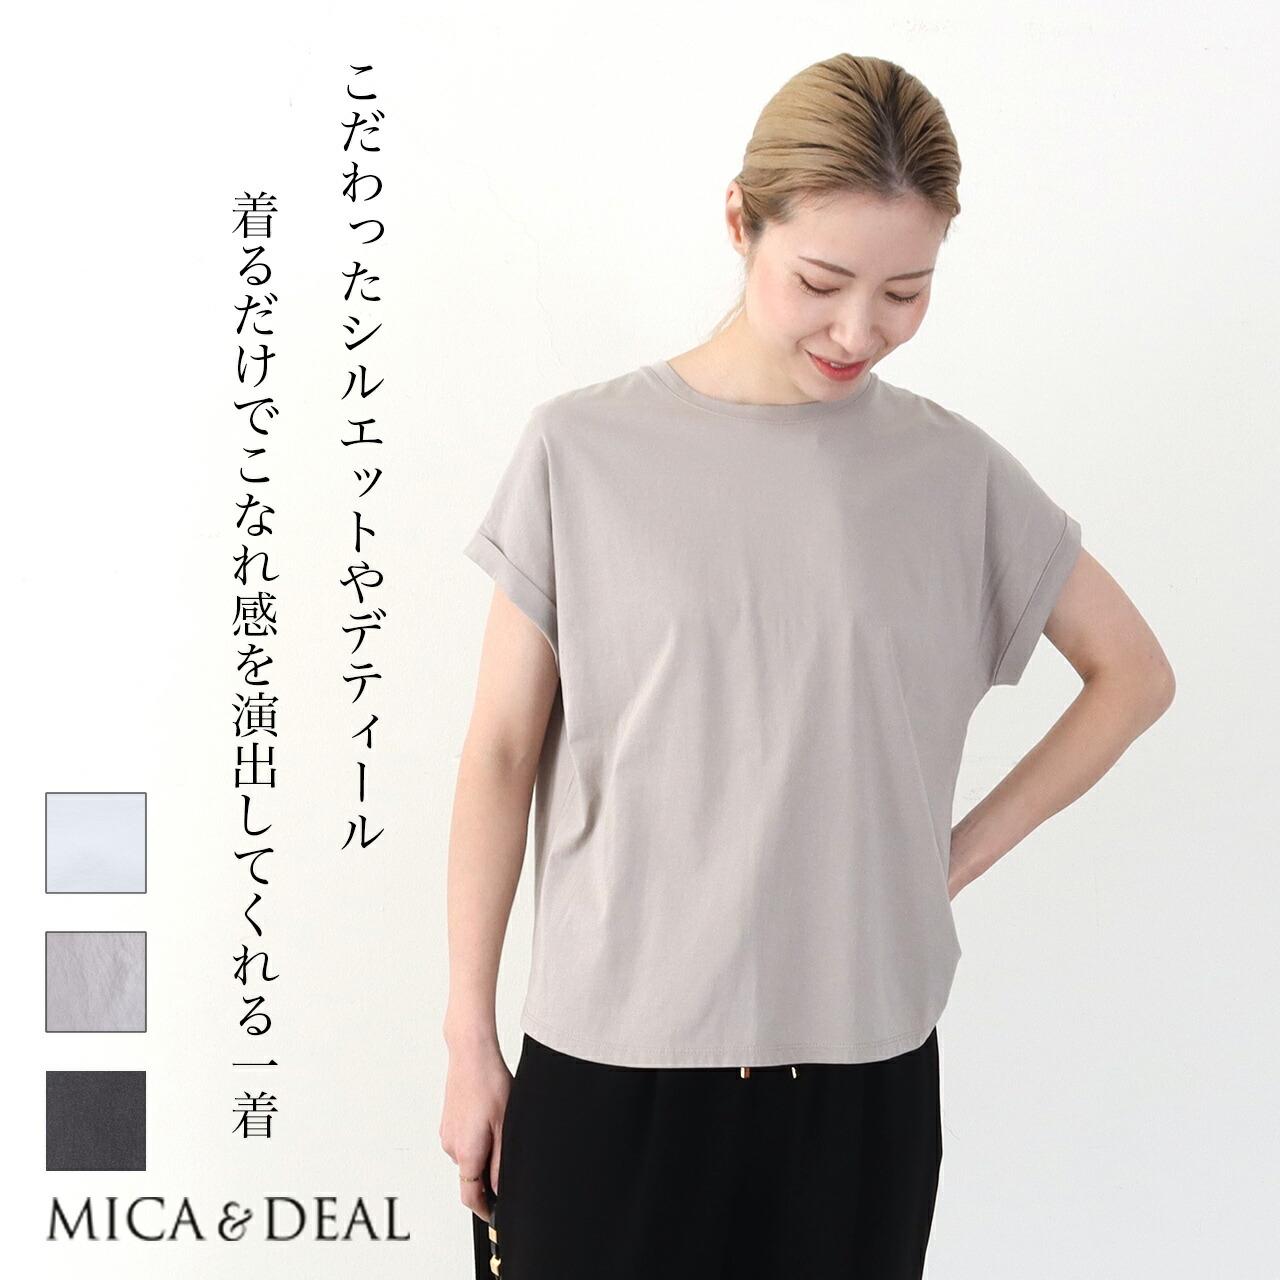 MICA&DEAL *マイカアンドディール ヘムラウンドTシャツ